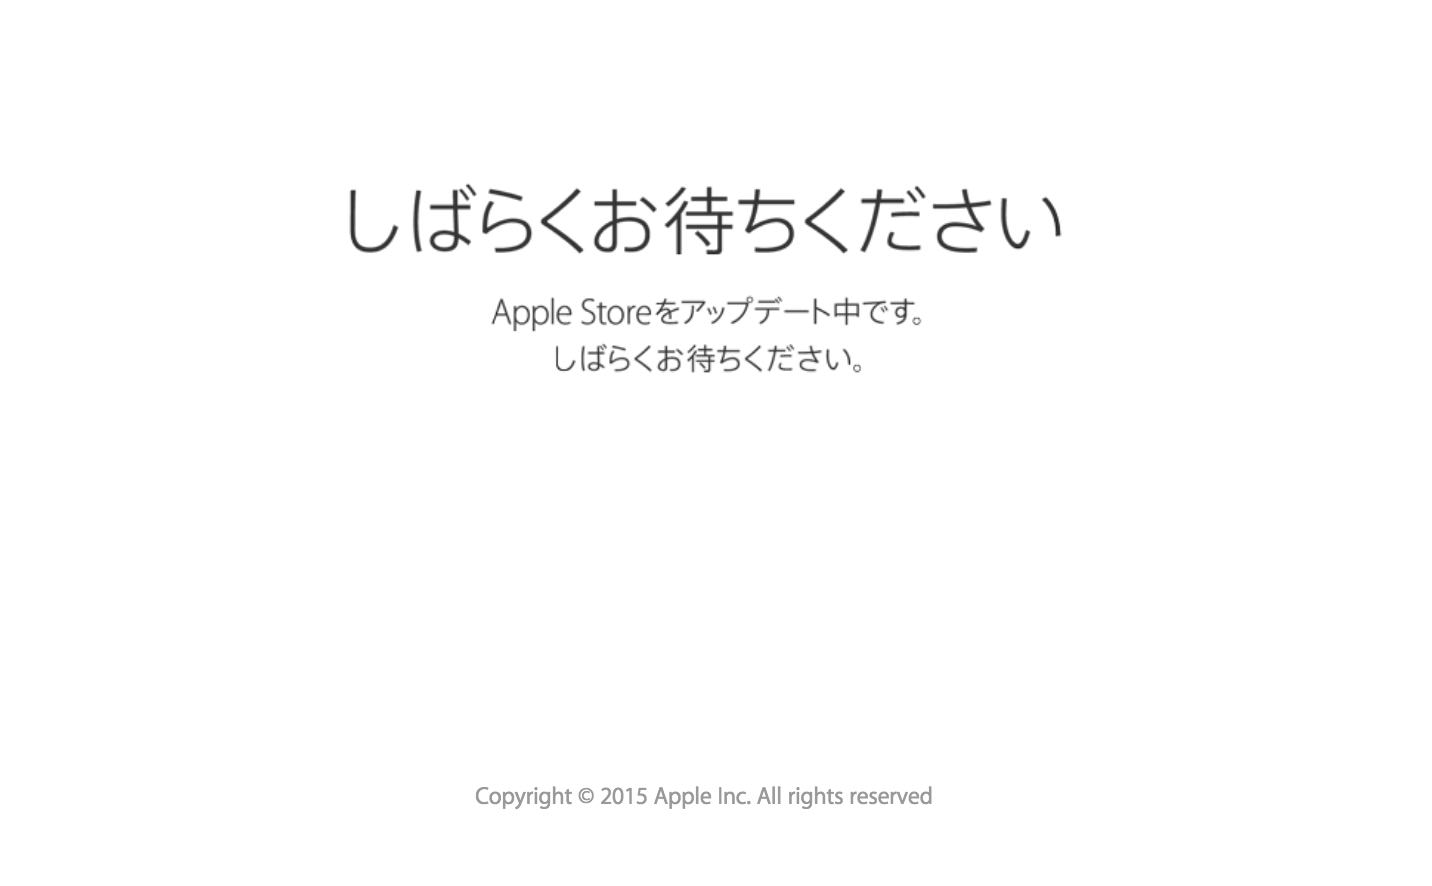 Apple Watchの予約開始と新しいMacBook 12インチの販売開始は本日16時1分から。